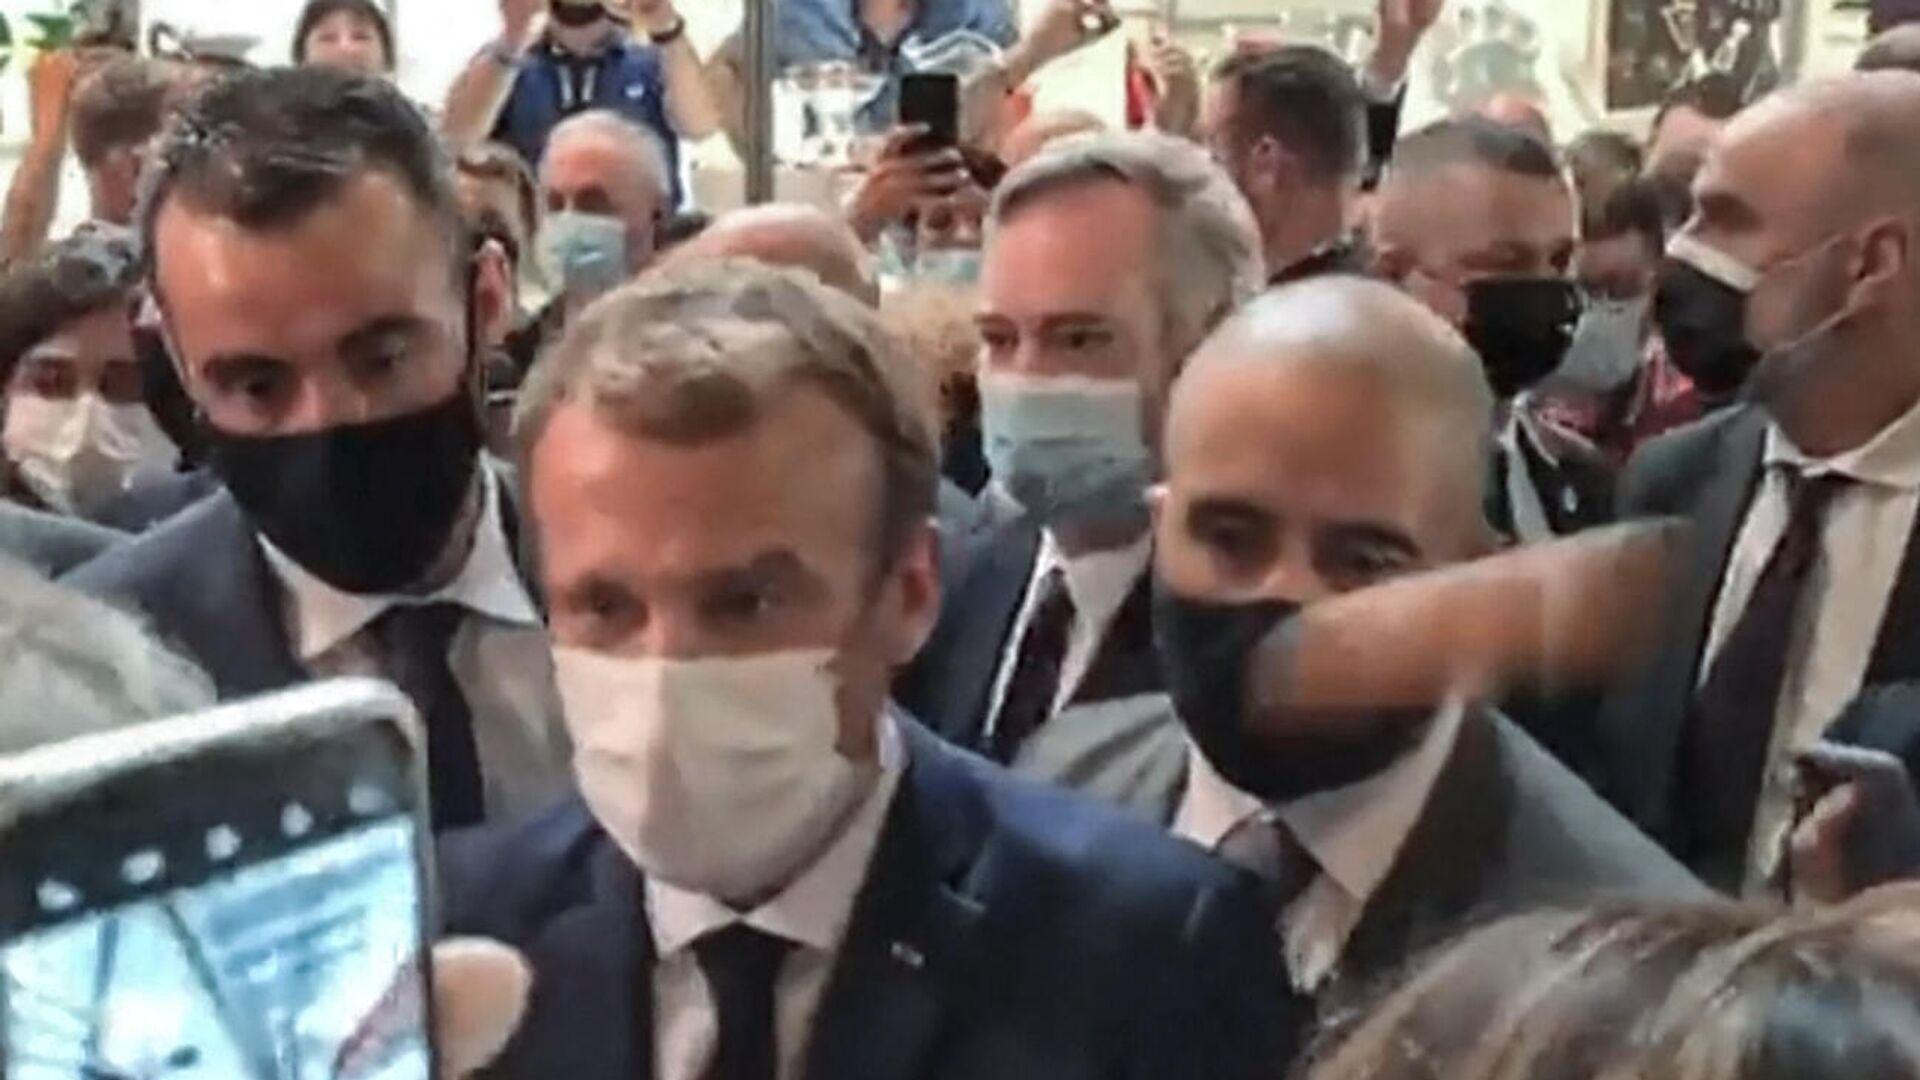 Eier-Attacke auf Frankreichs Staatspräsident Emmanuel Macron. Lyon, 27. September 2021 - SNA, 1920, 28.09.2021